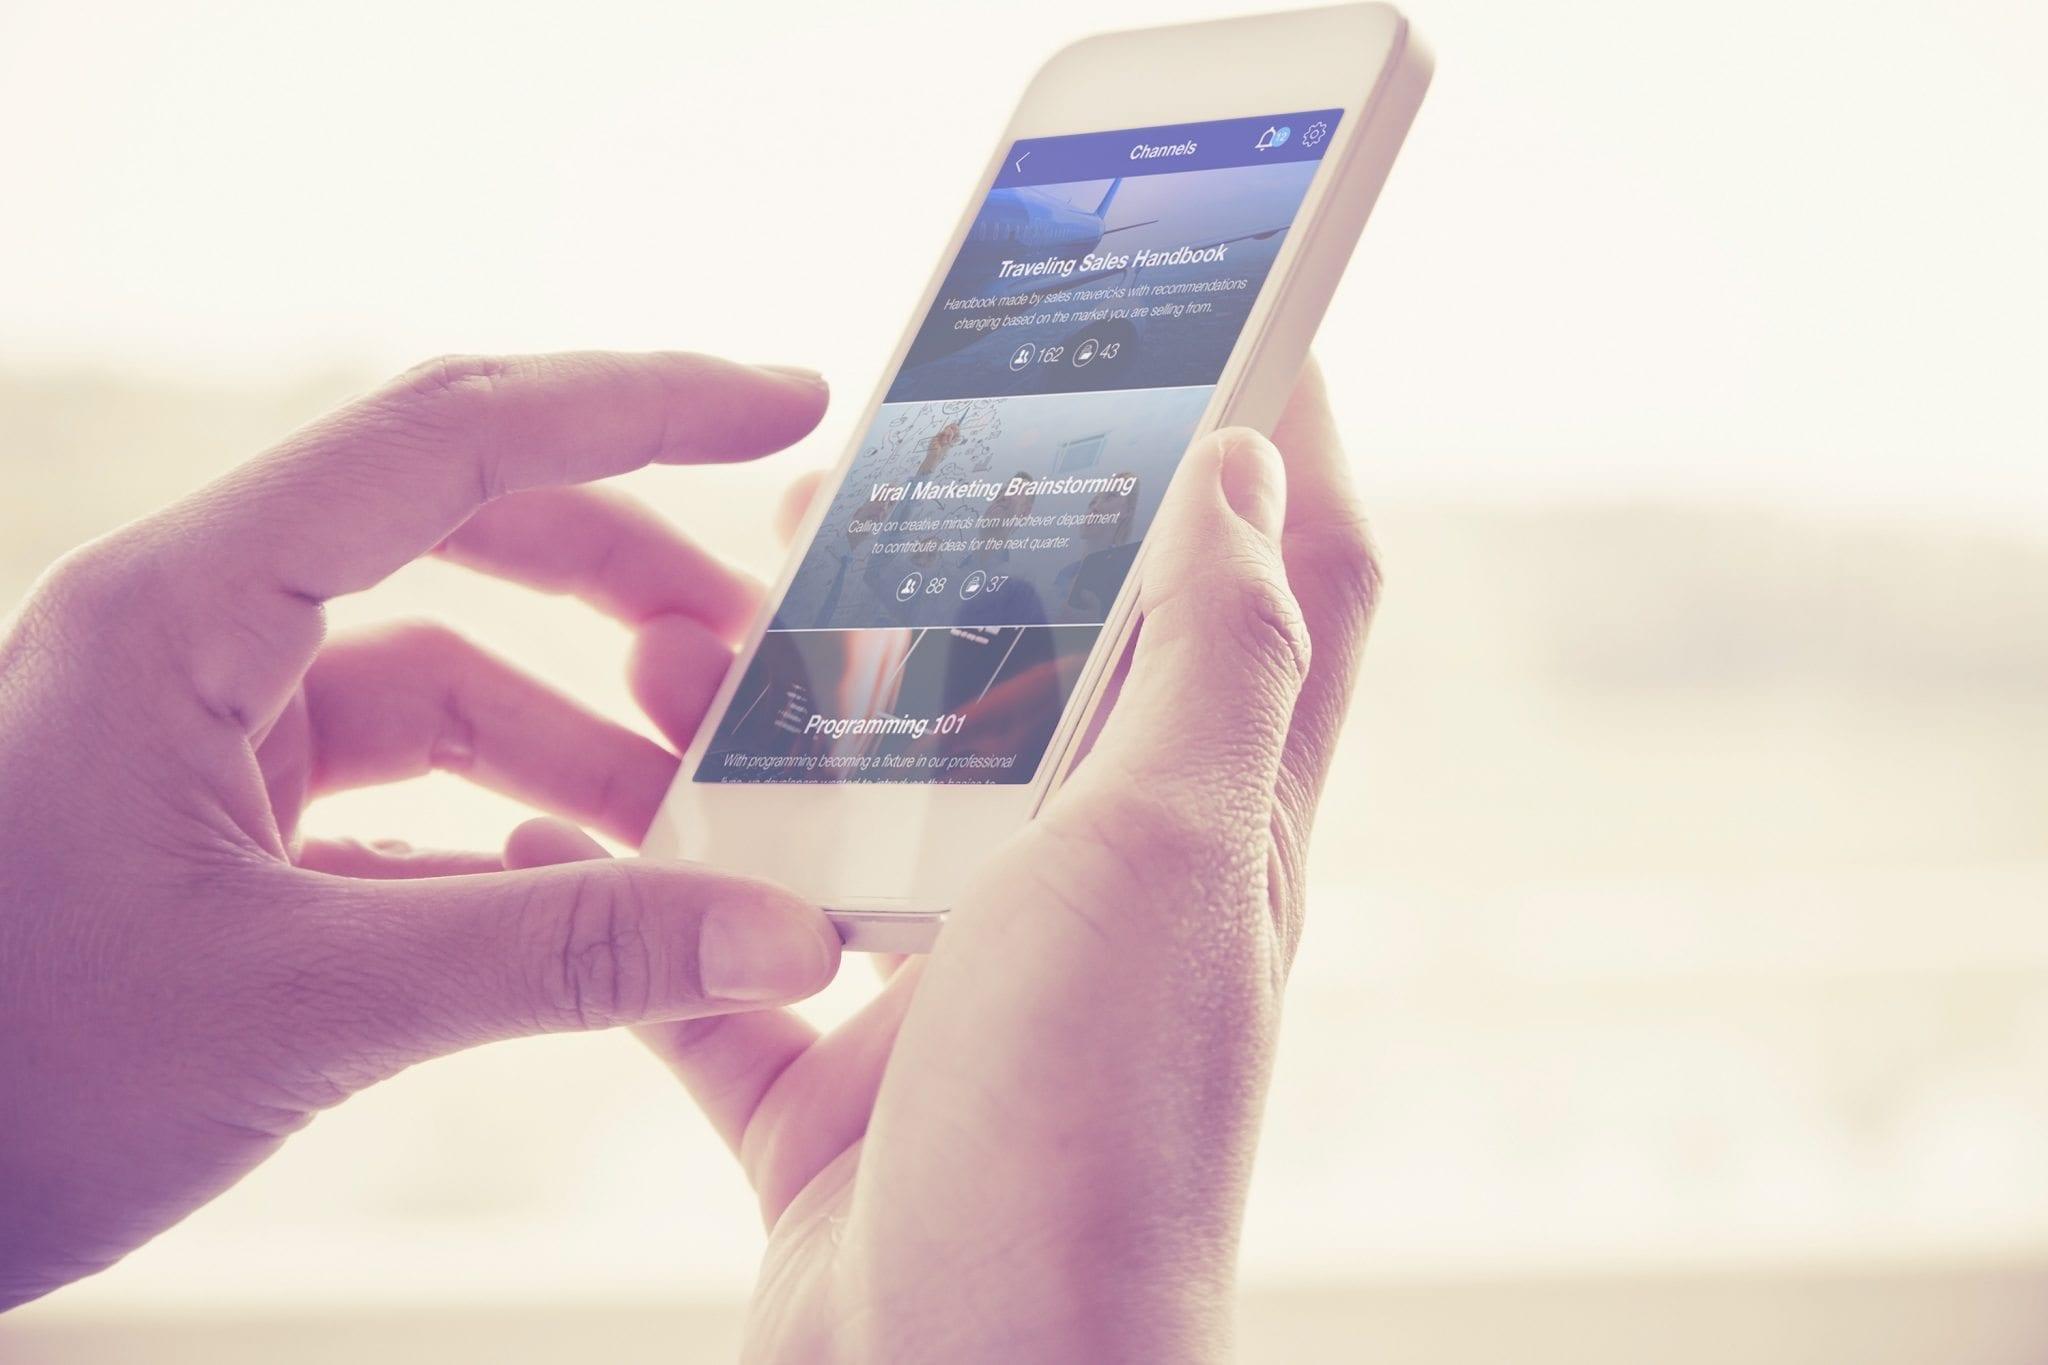 BoostHQ mobile app